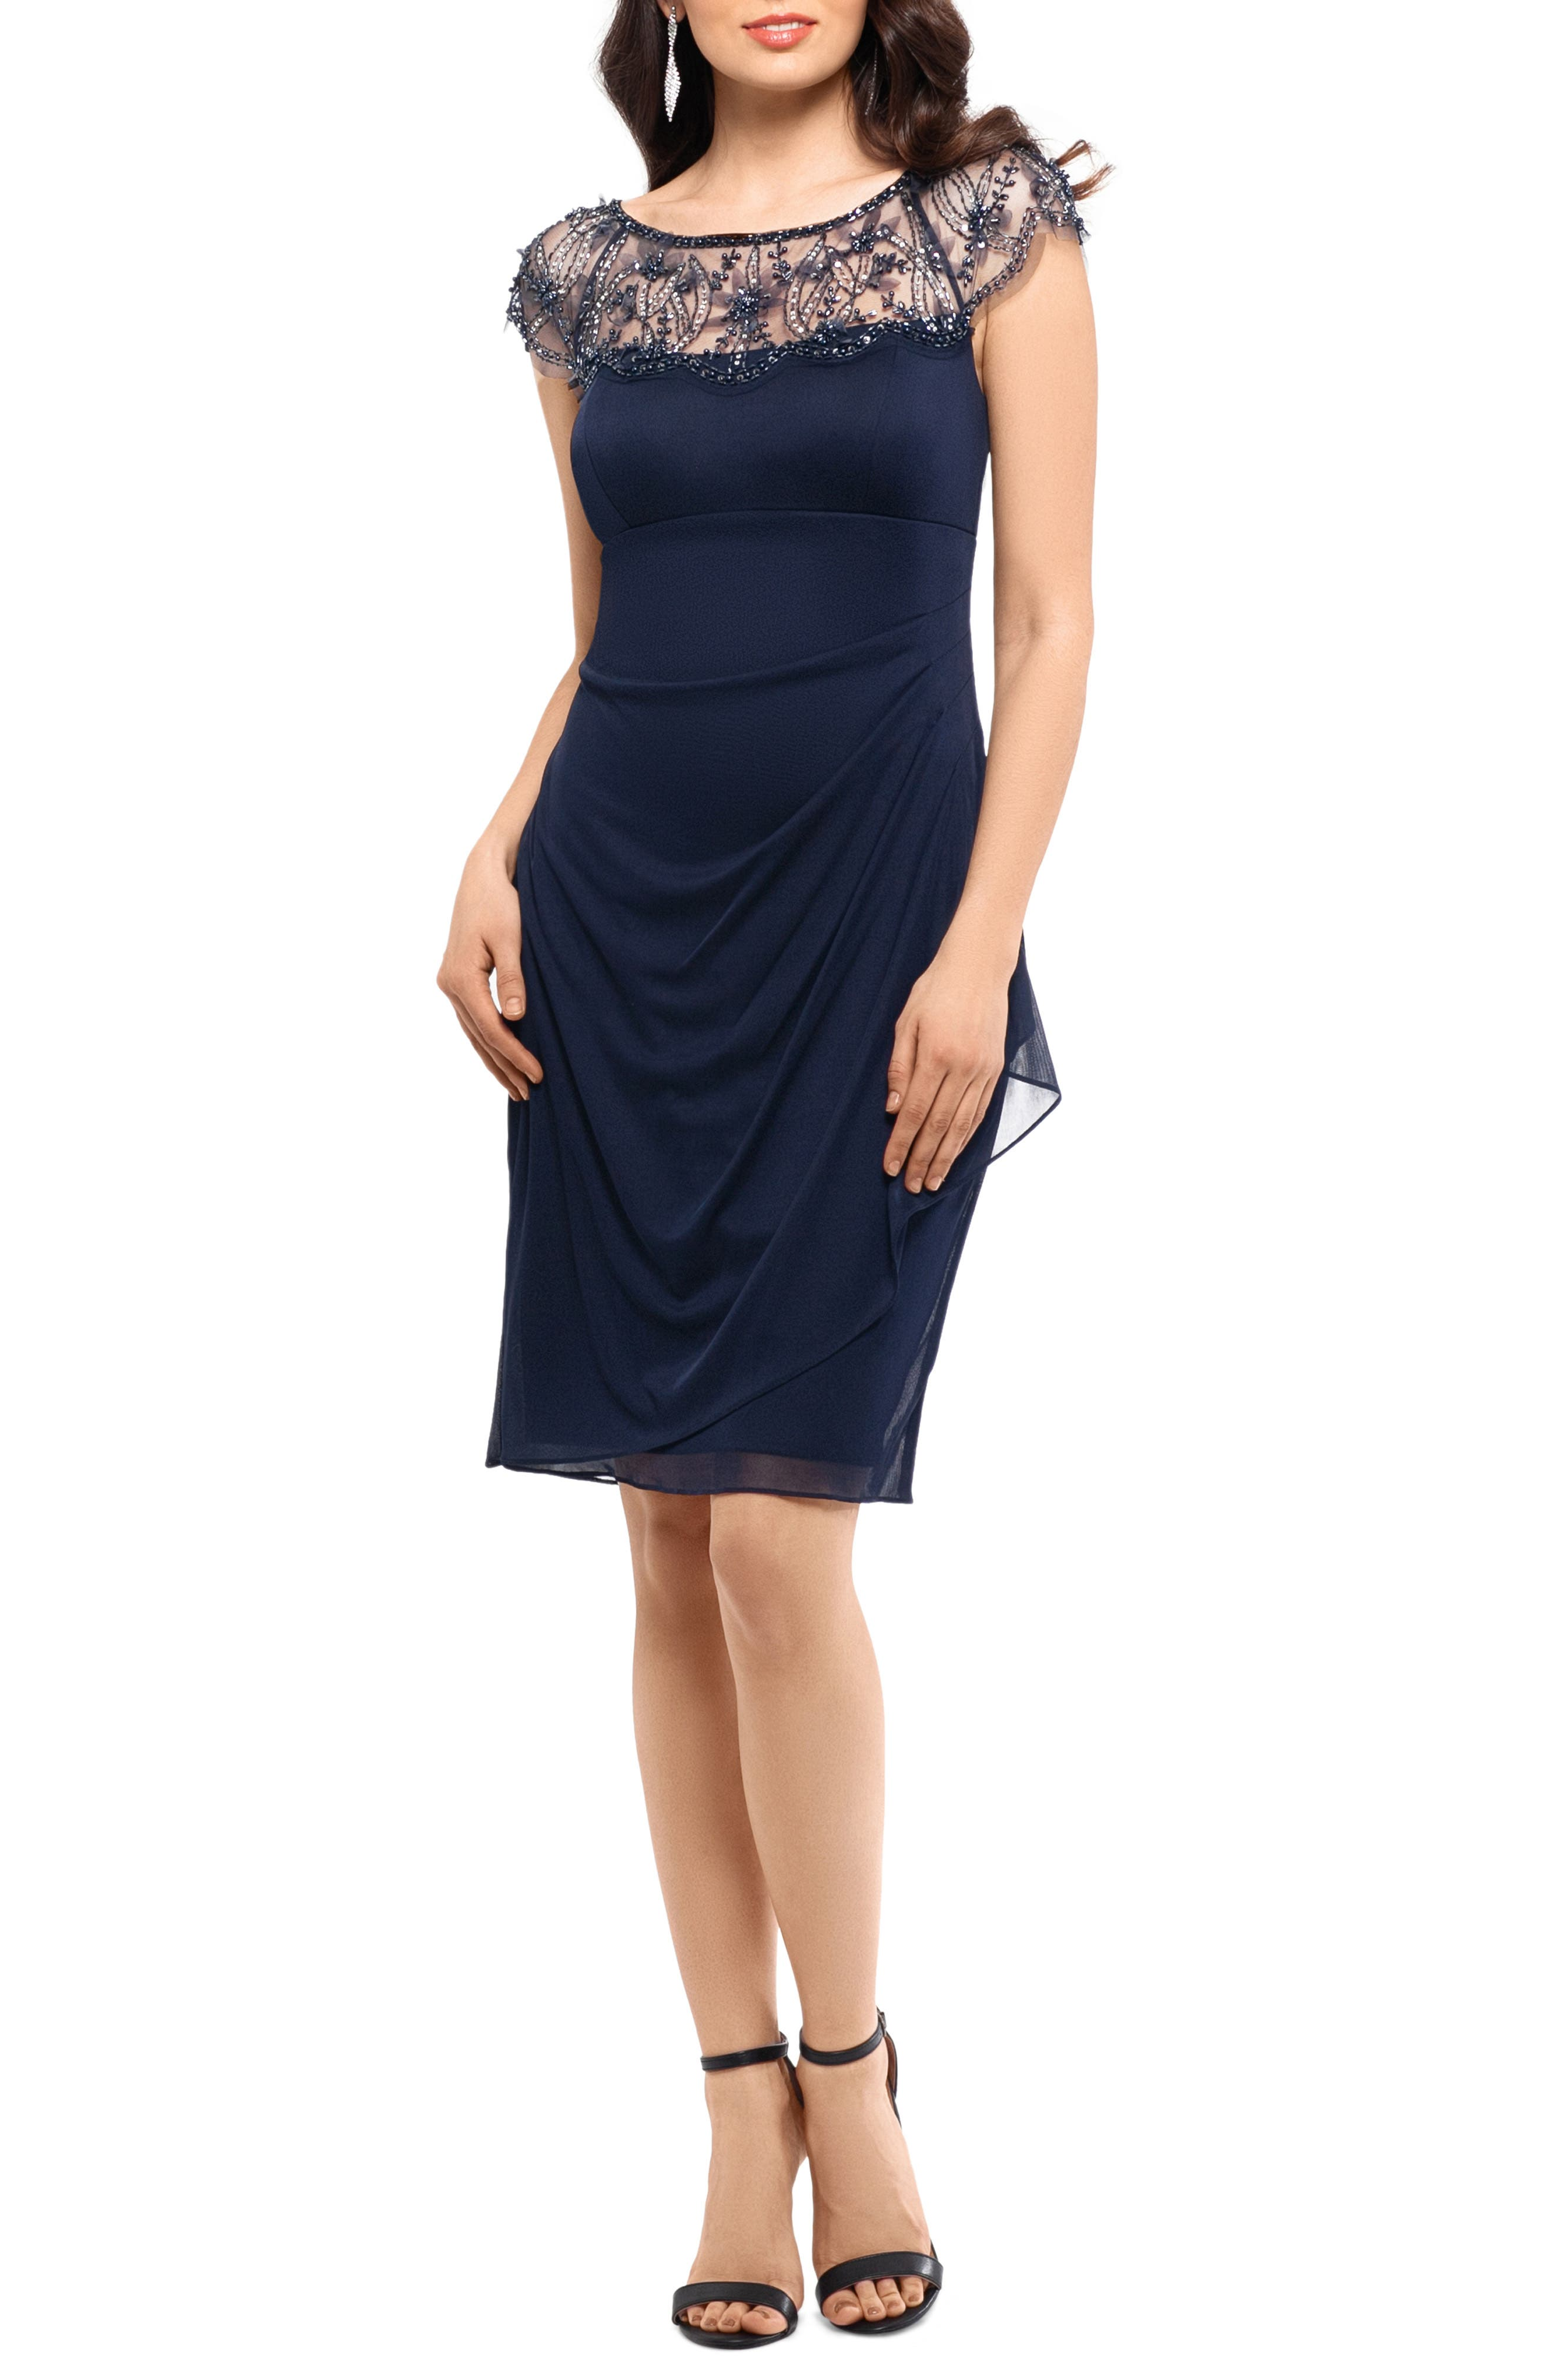 9a68dd01 Xscape Beaded Illusion Lace Detail Cocktail Dress, Blue